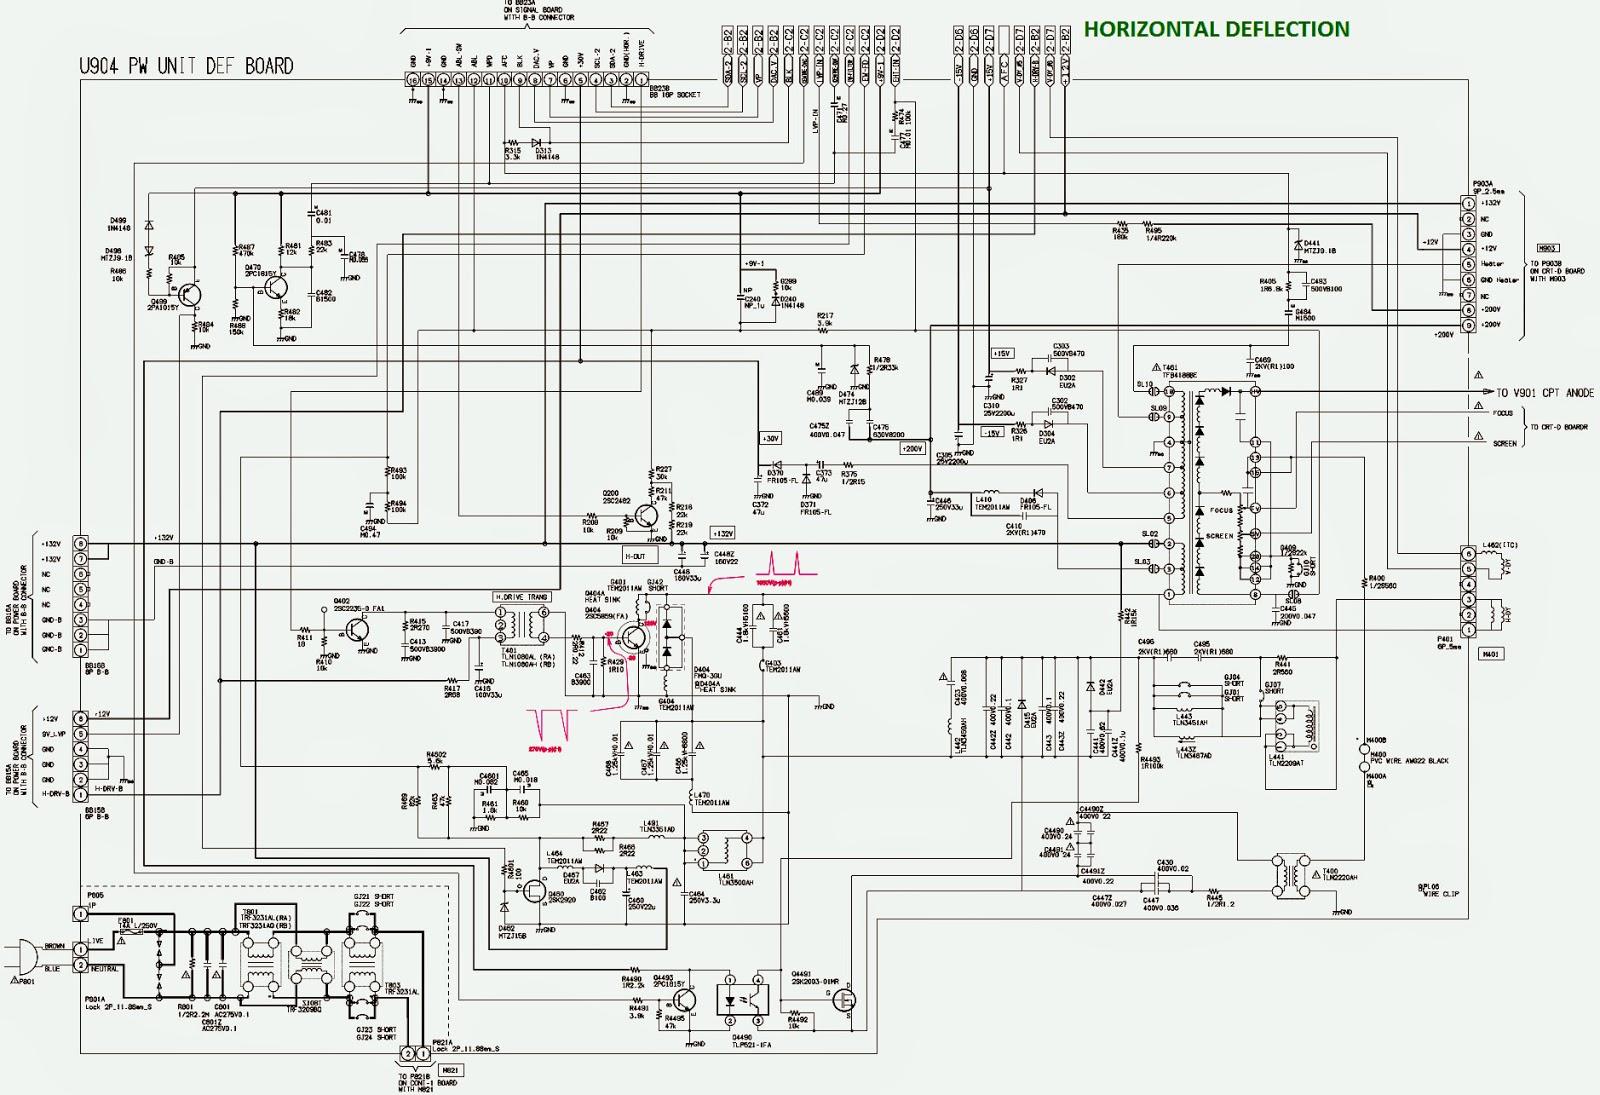 horizontal deflection circuit diagram